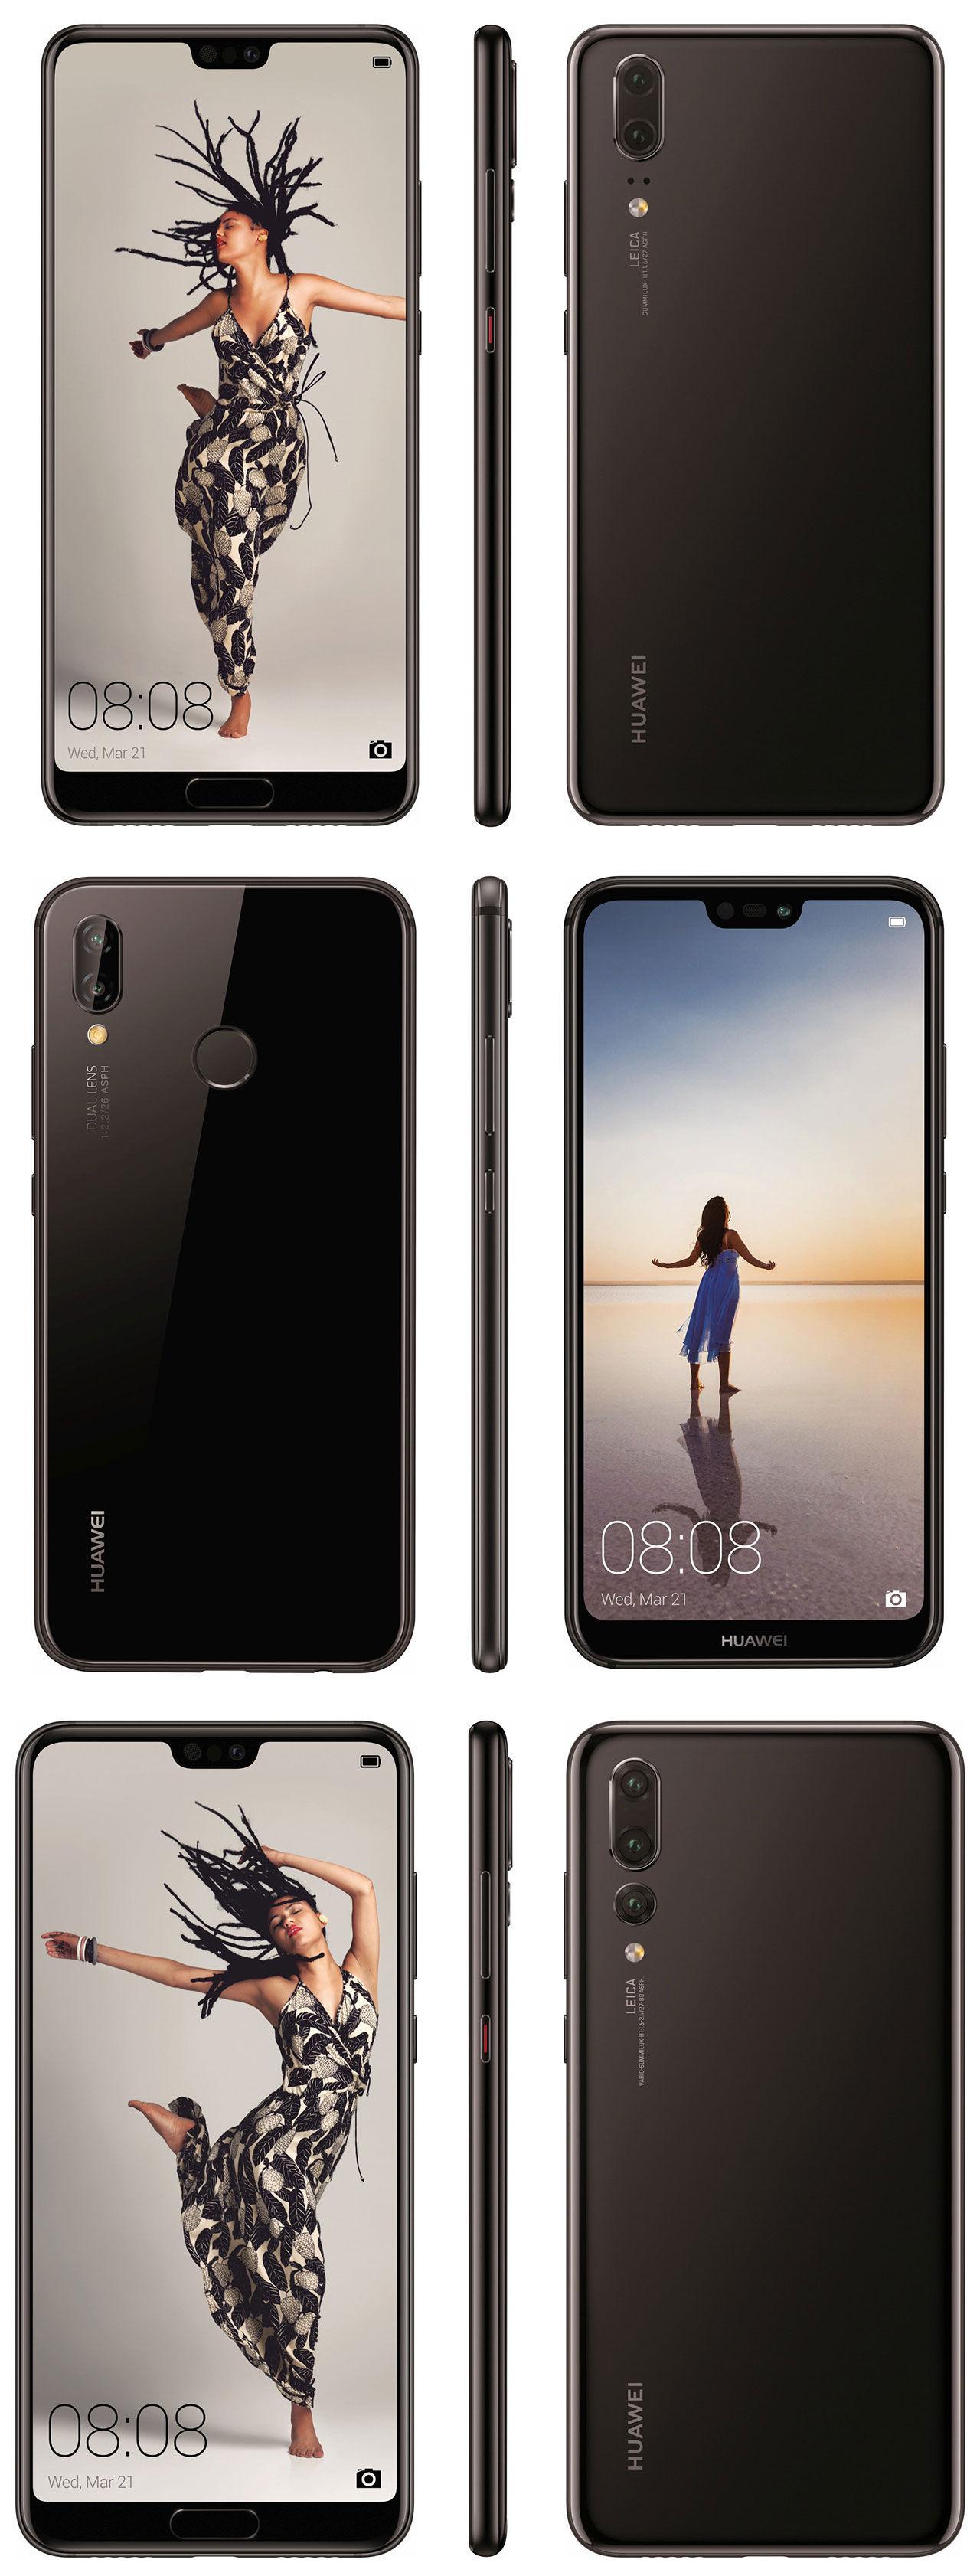 Huawei P20 Lite, P20 och P20 Pro läcker